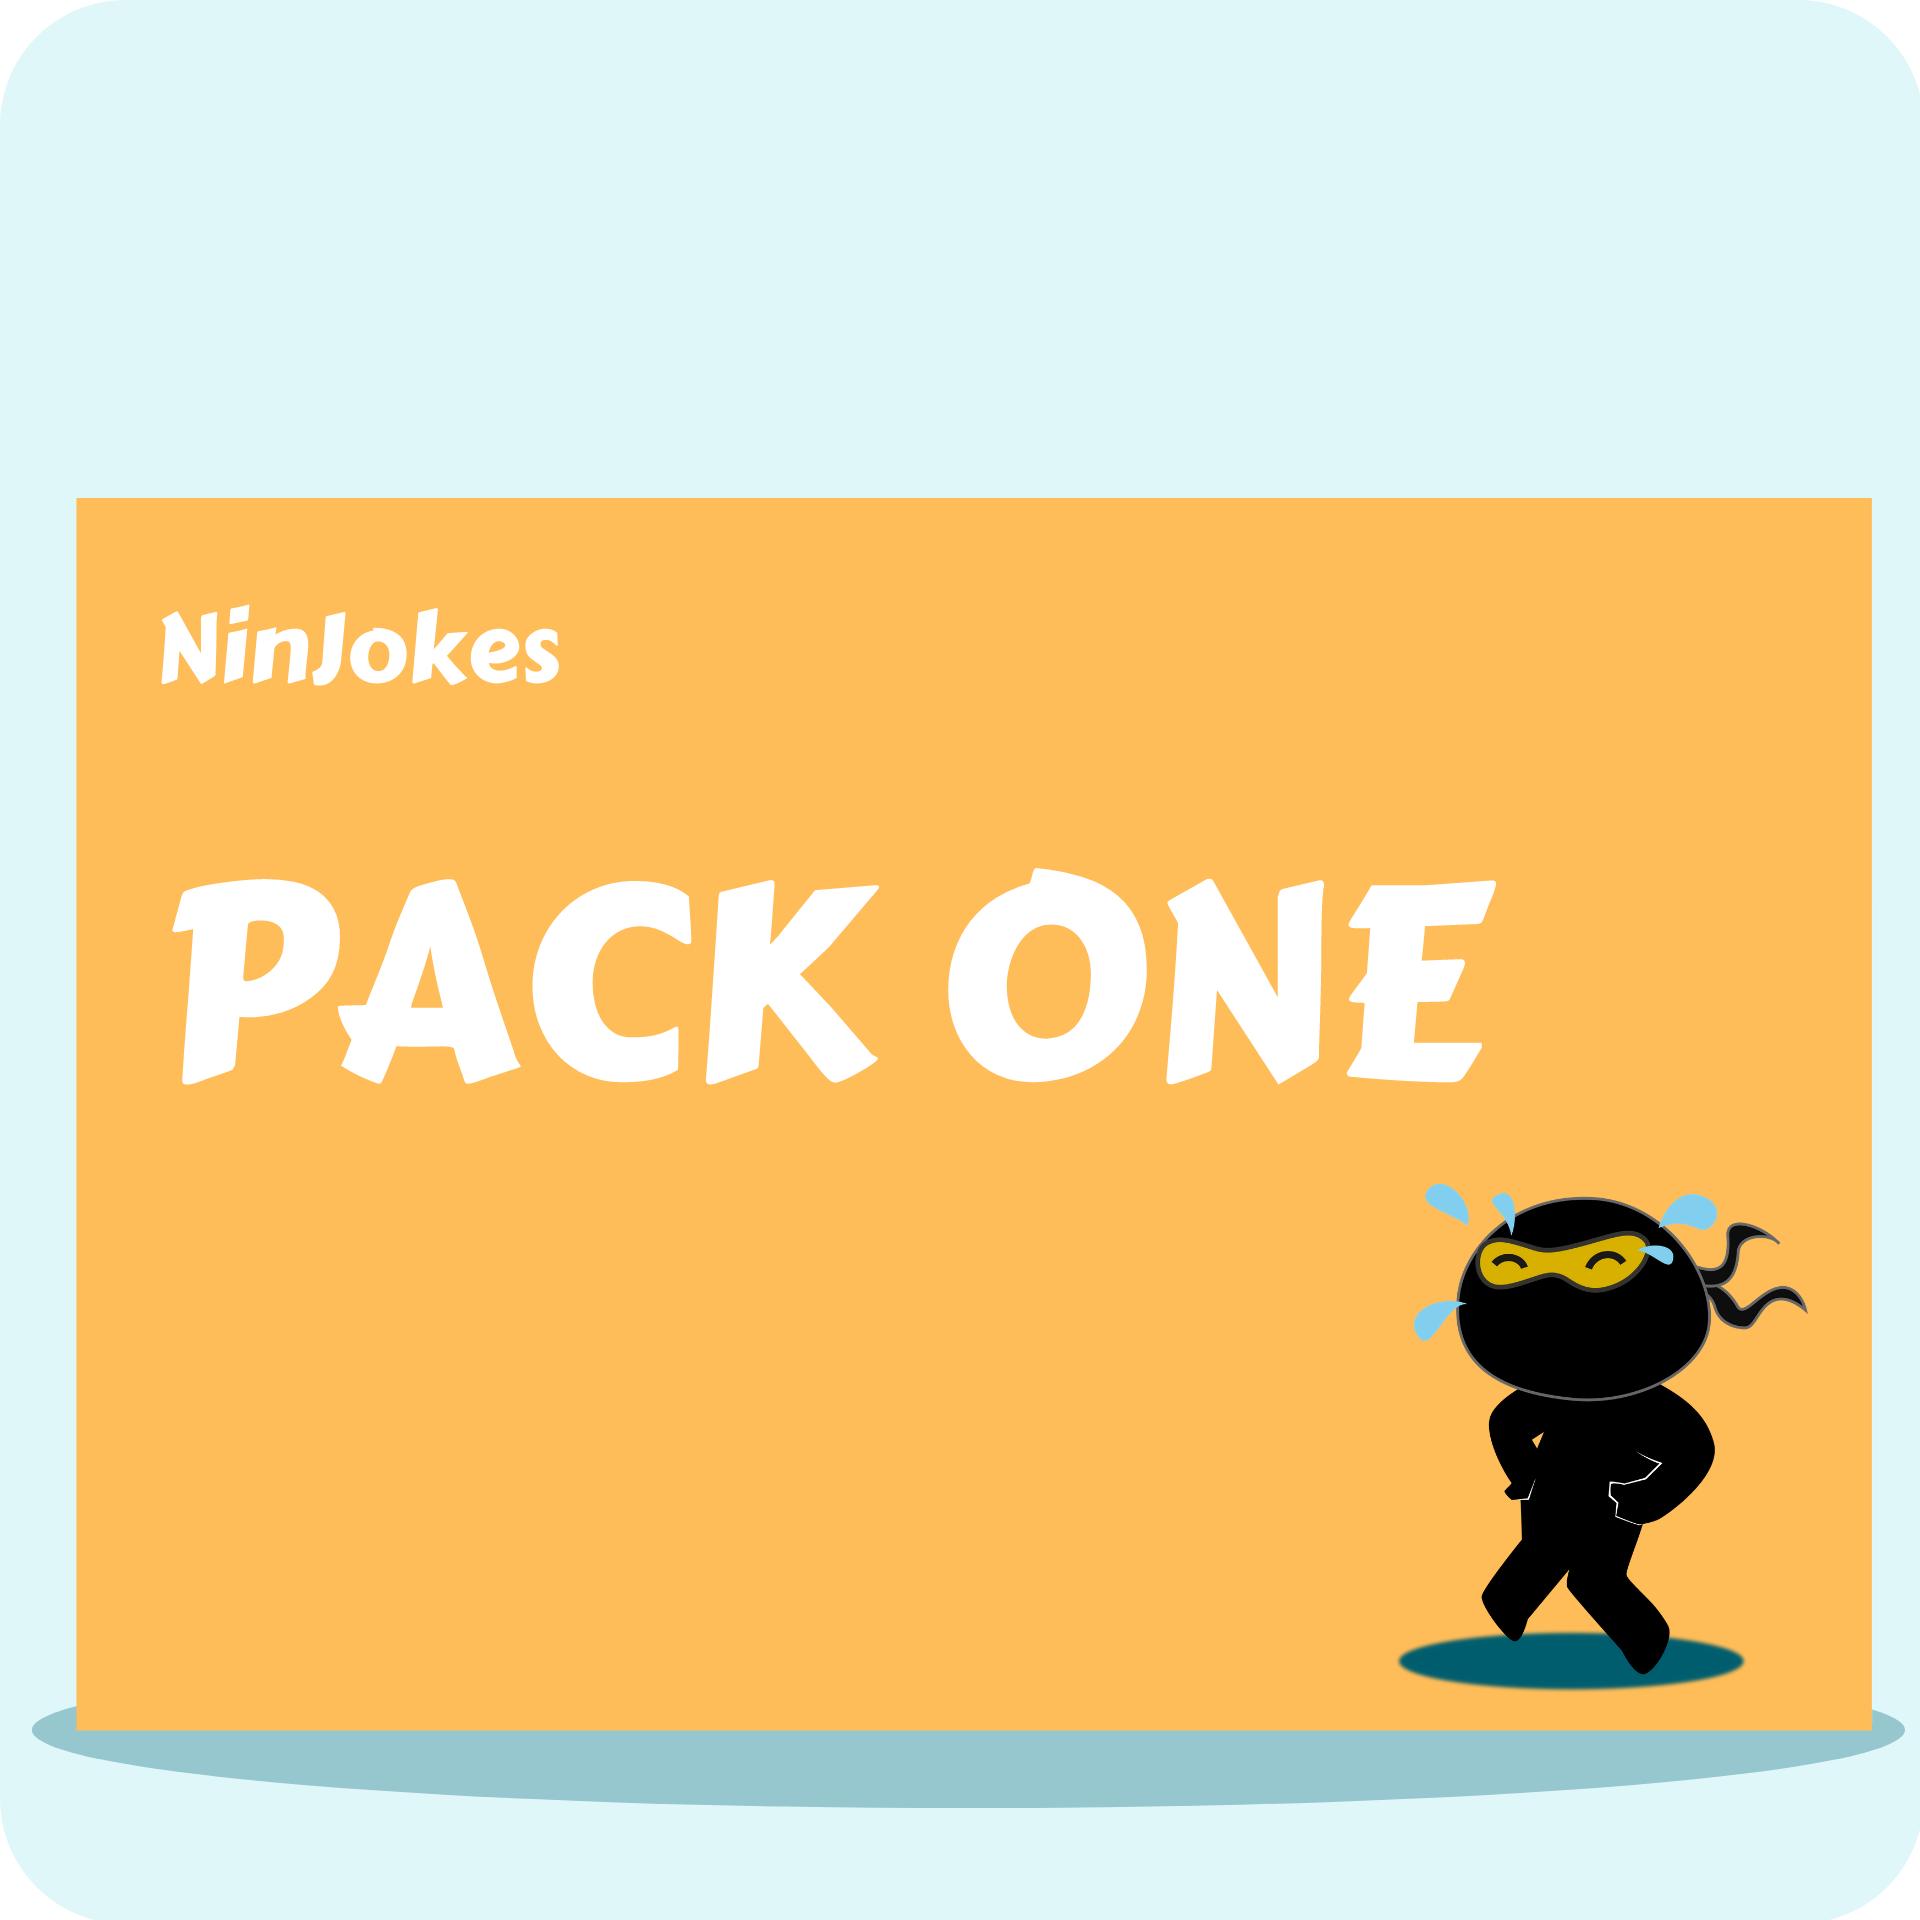 NinJokes Pack One